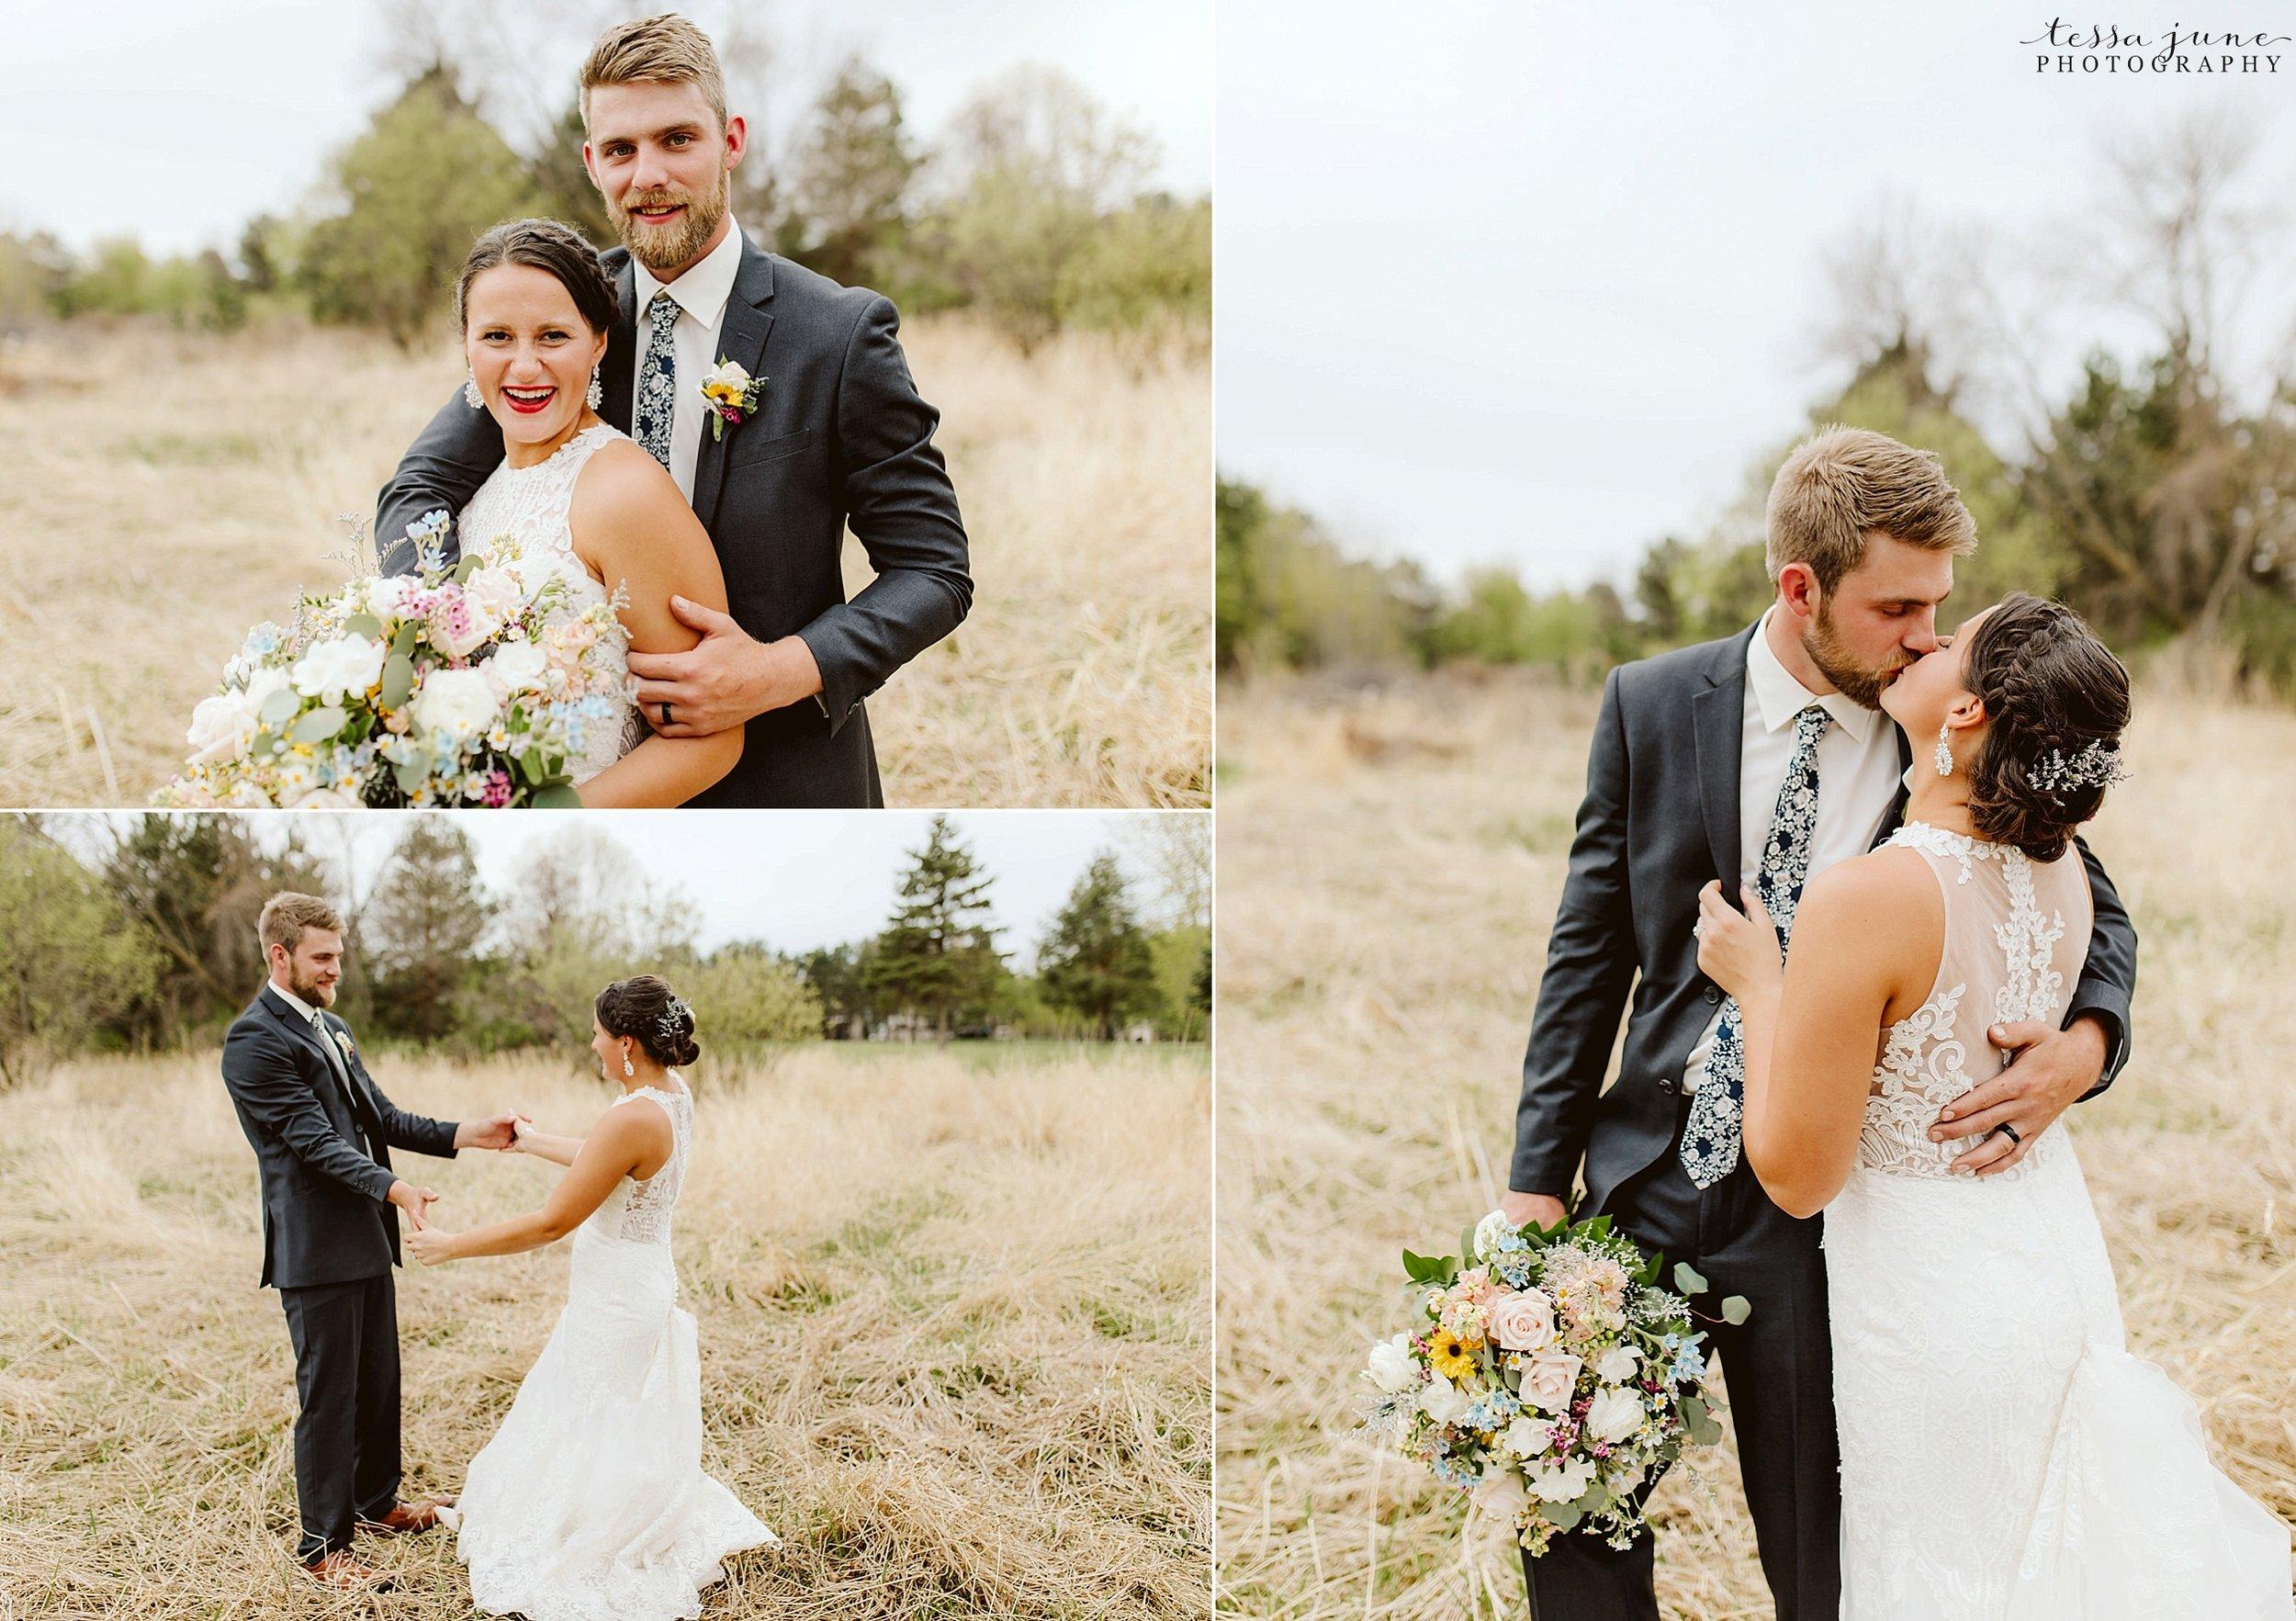 The-grands-at-mulligans-wedding-sartell-minnesota-spring-floral-spring-garden-wedding-126.jpg